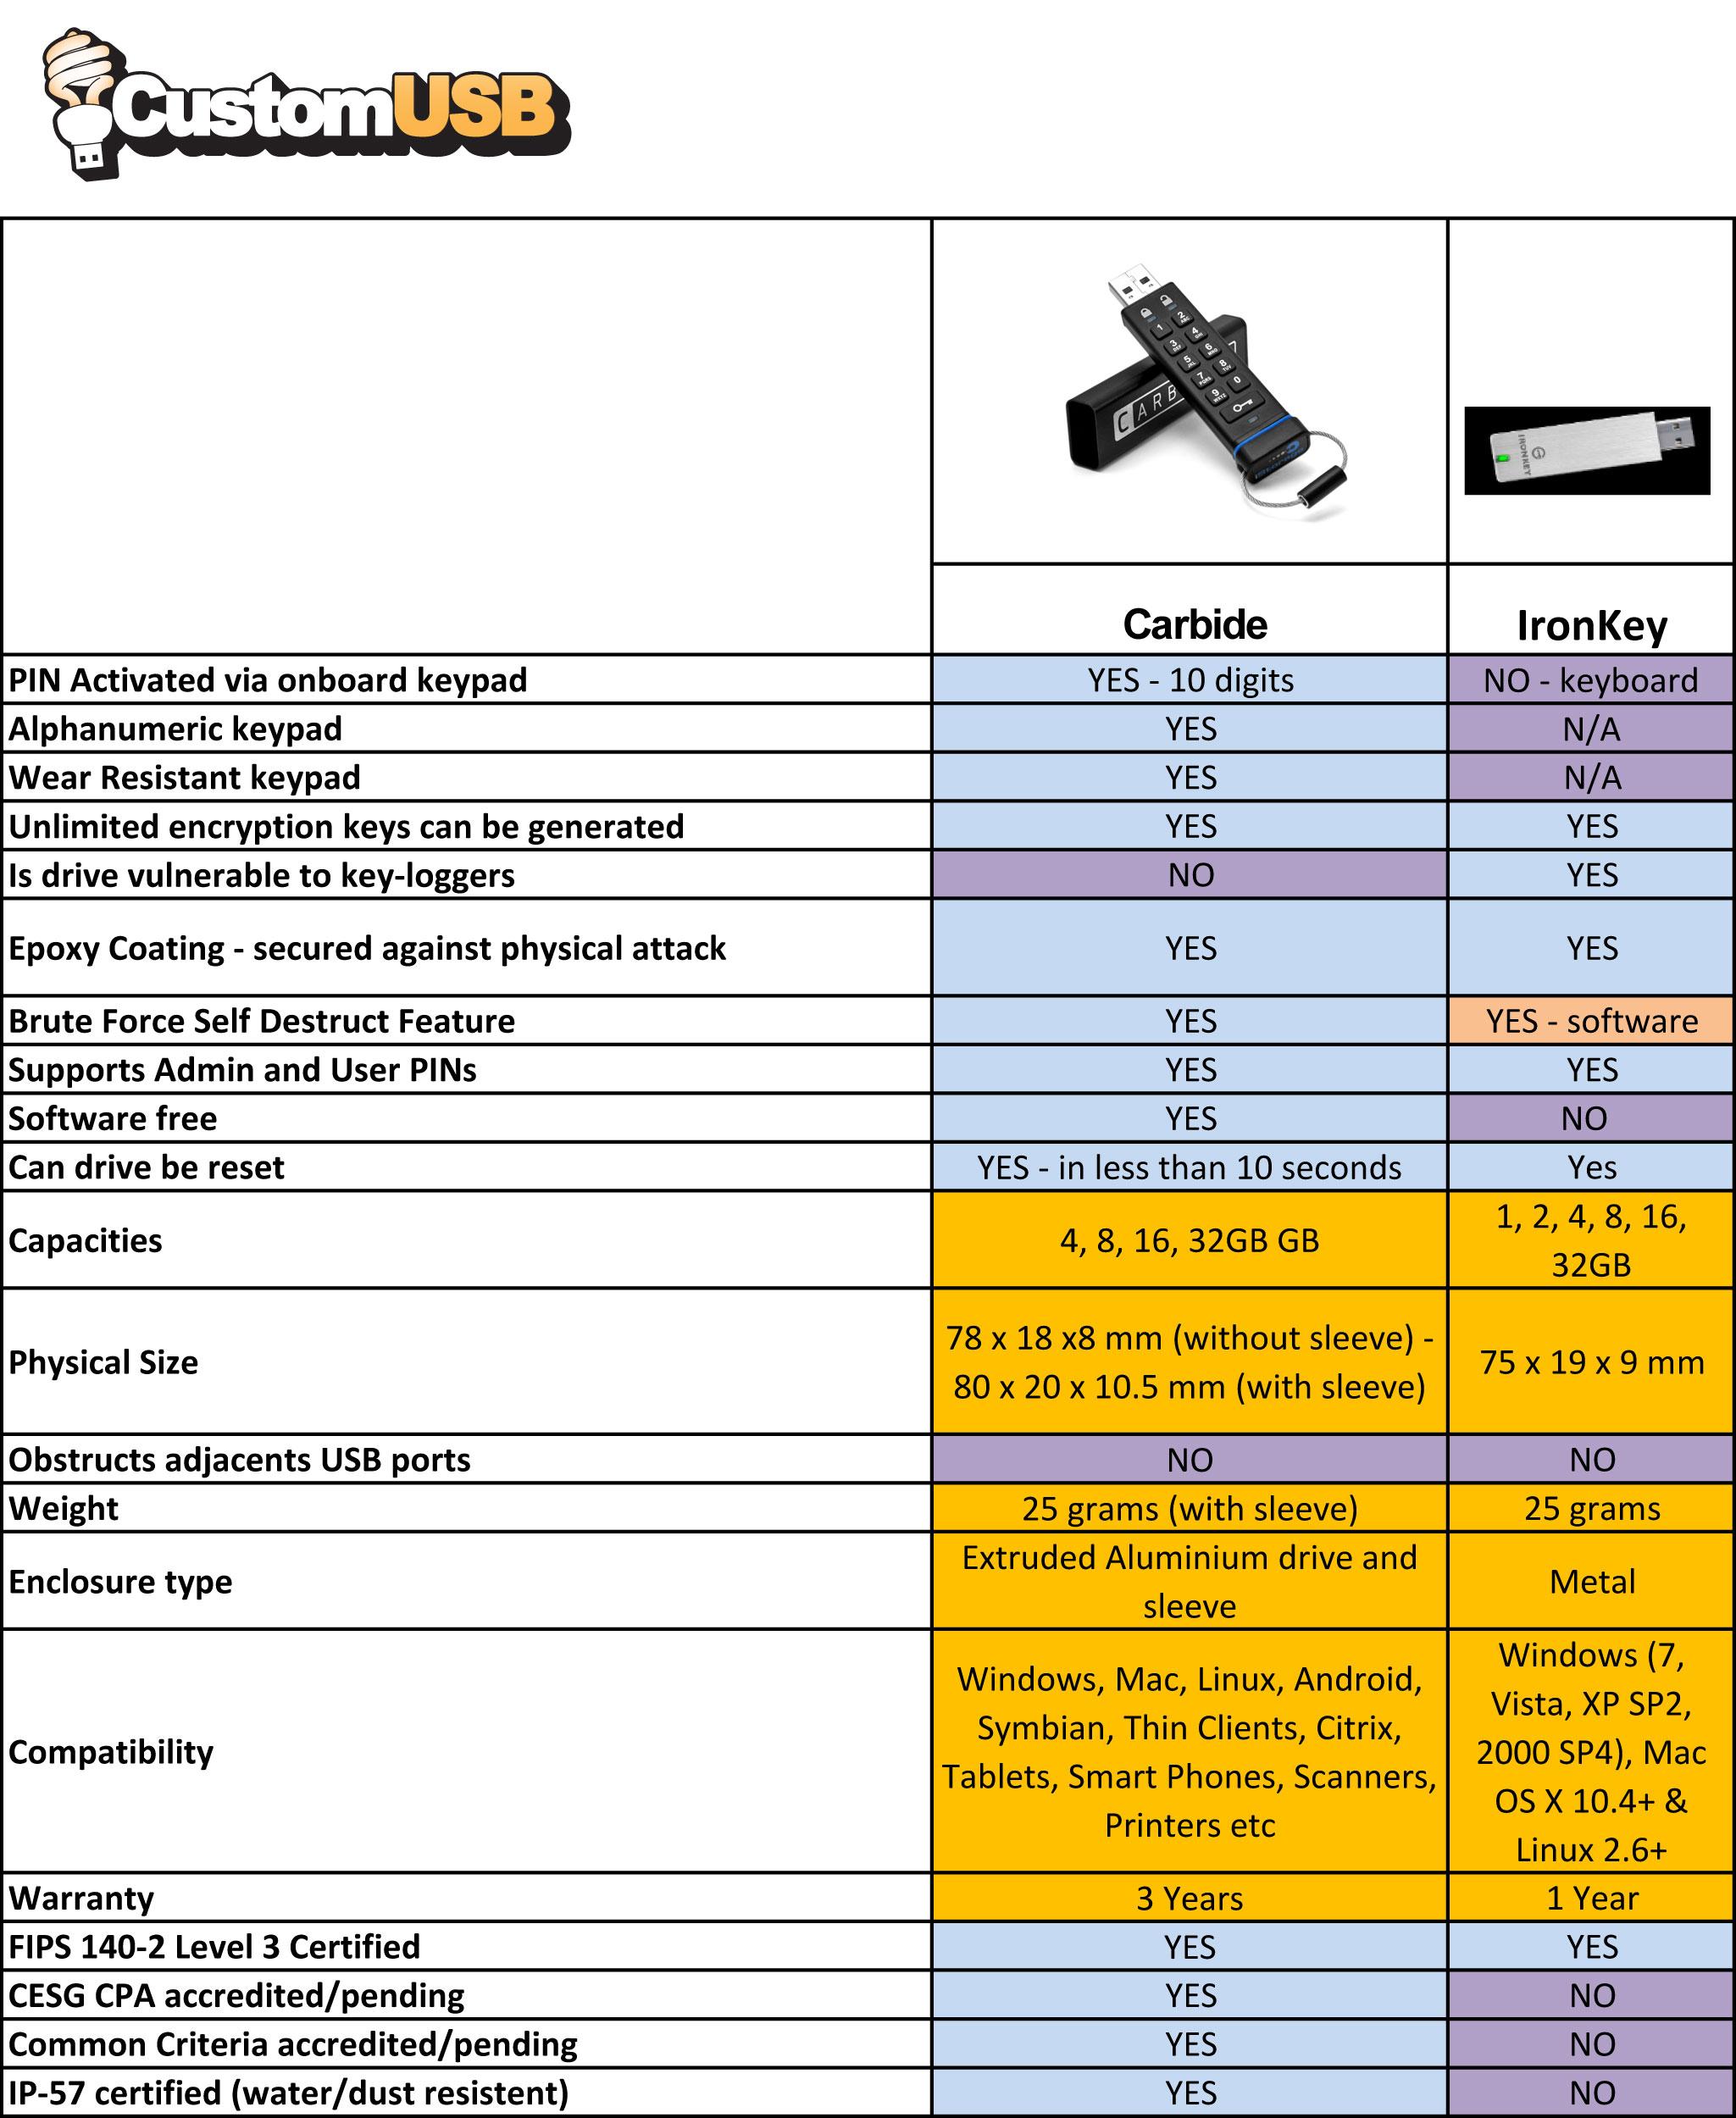 PortableApps.com Carbide Comparison